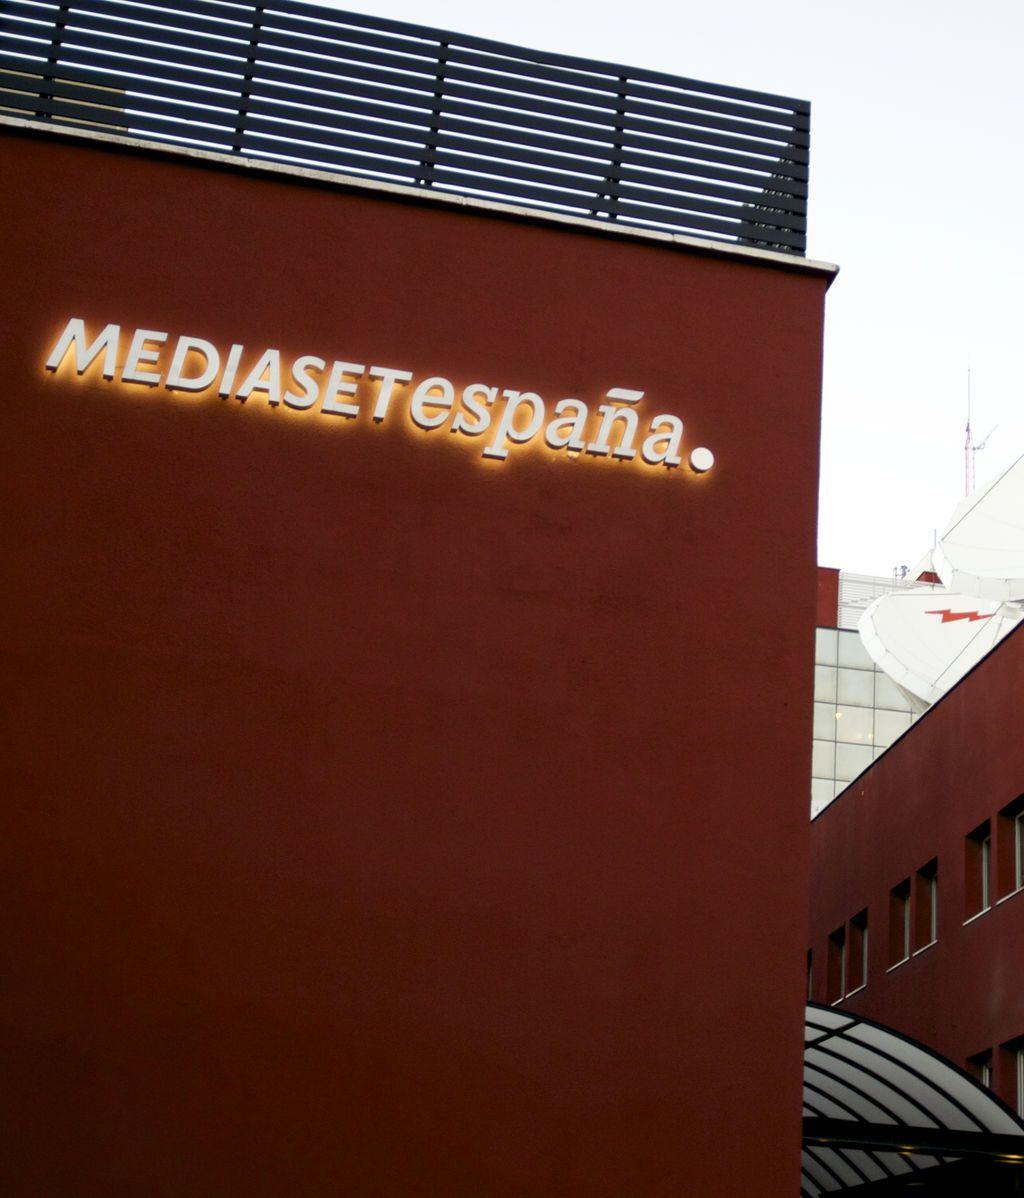 Mediaset España (2)